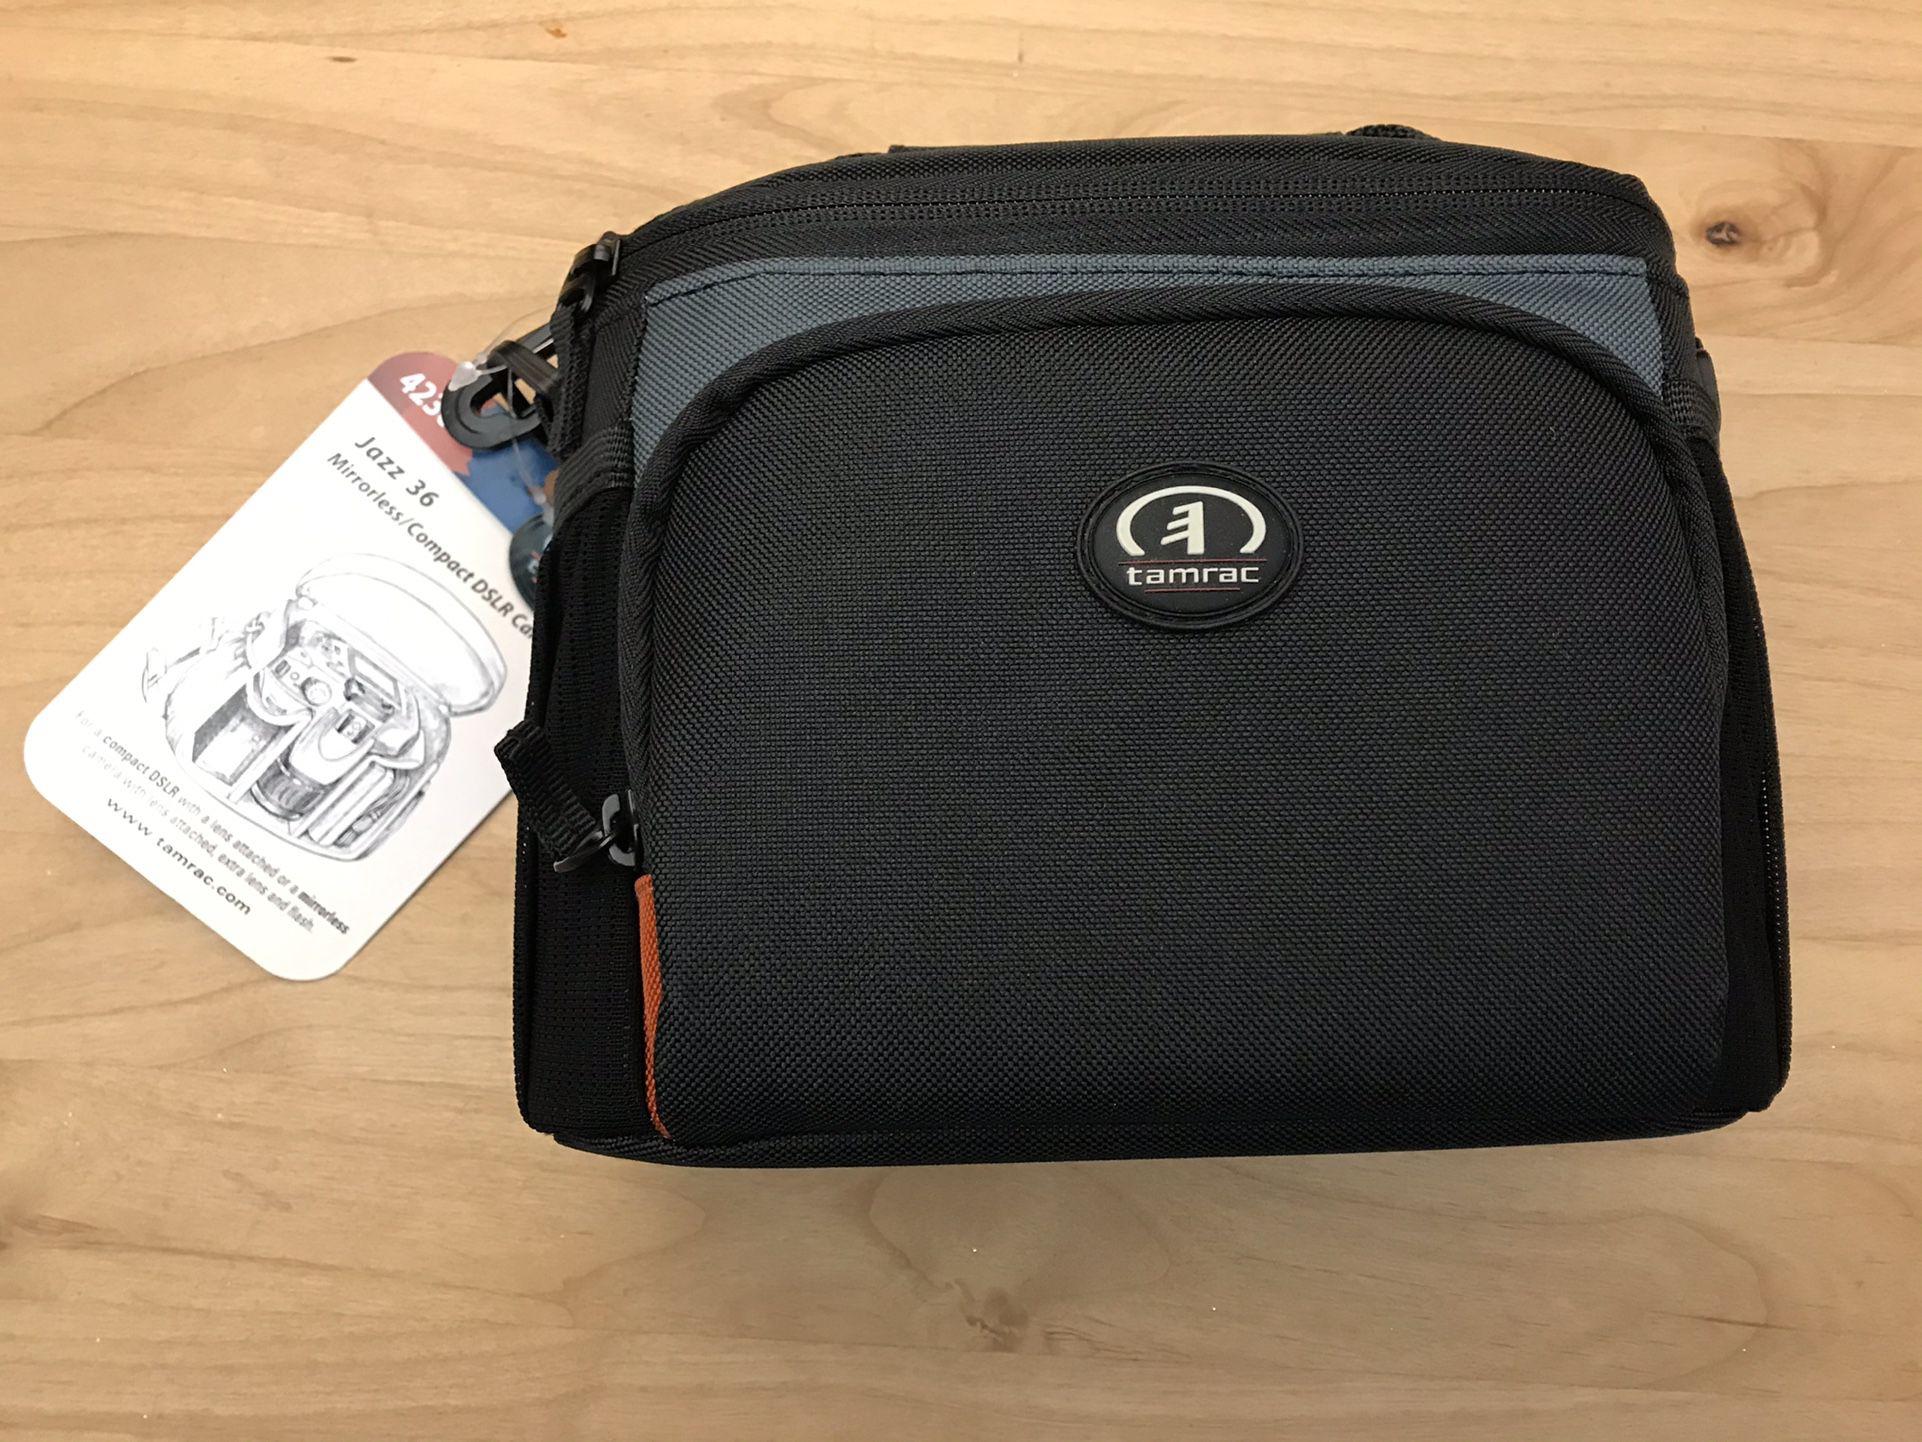 New In Package Tamrac Jazz 36 Mirrorless Compact DSLR Camera Bag